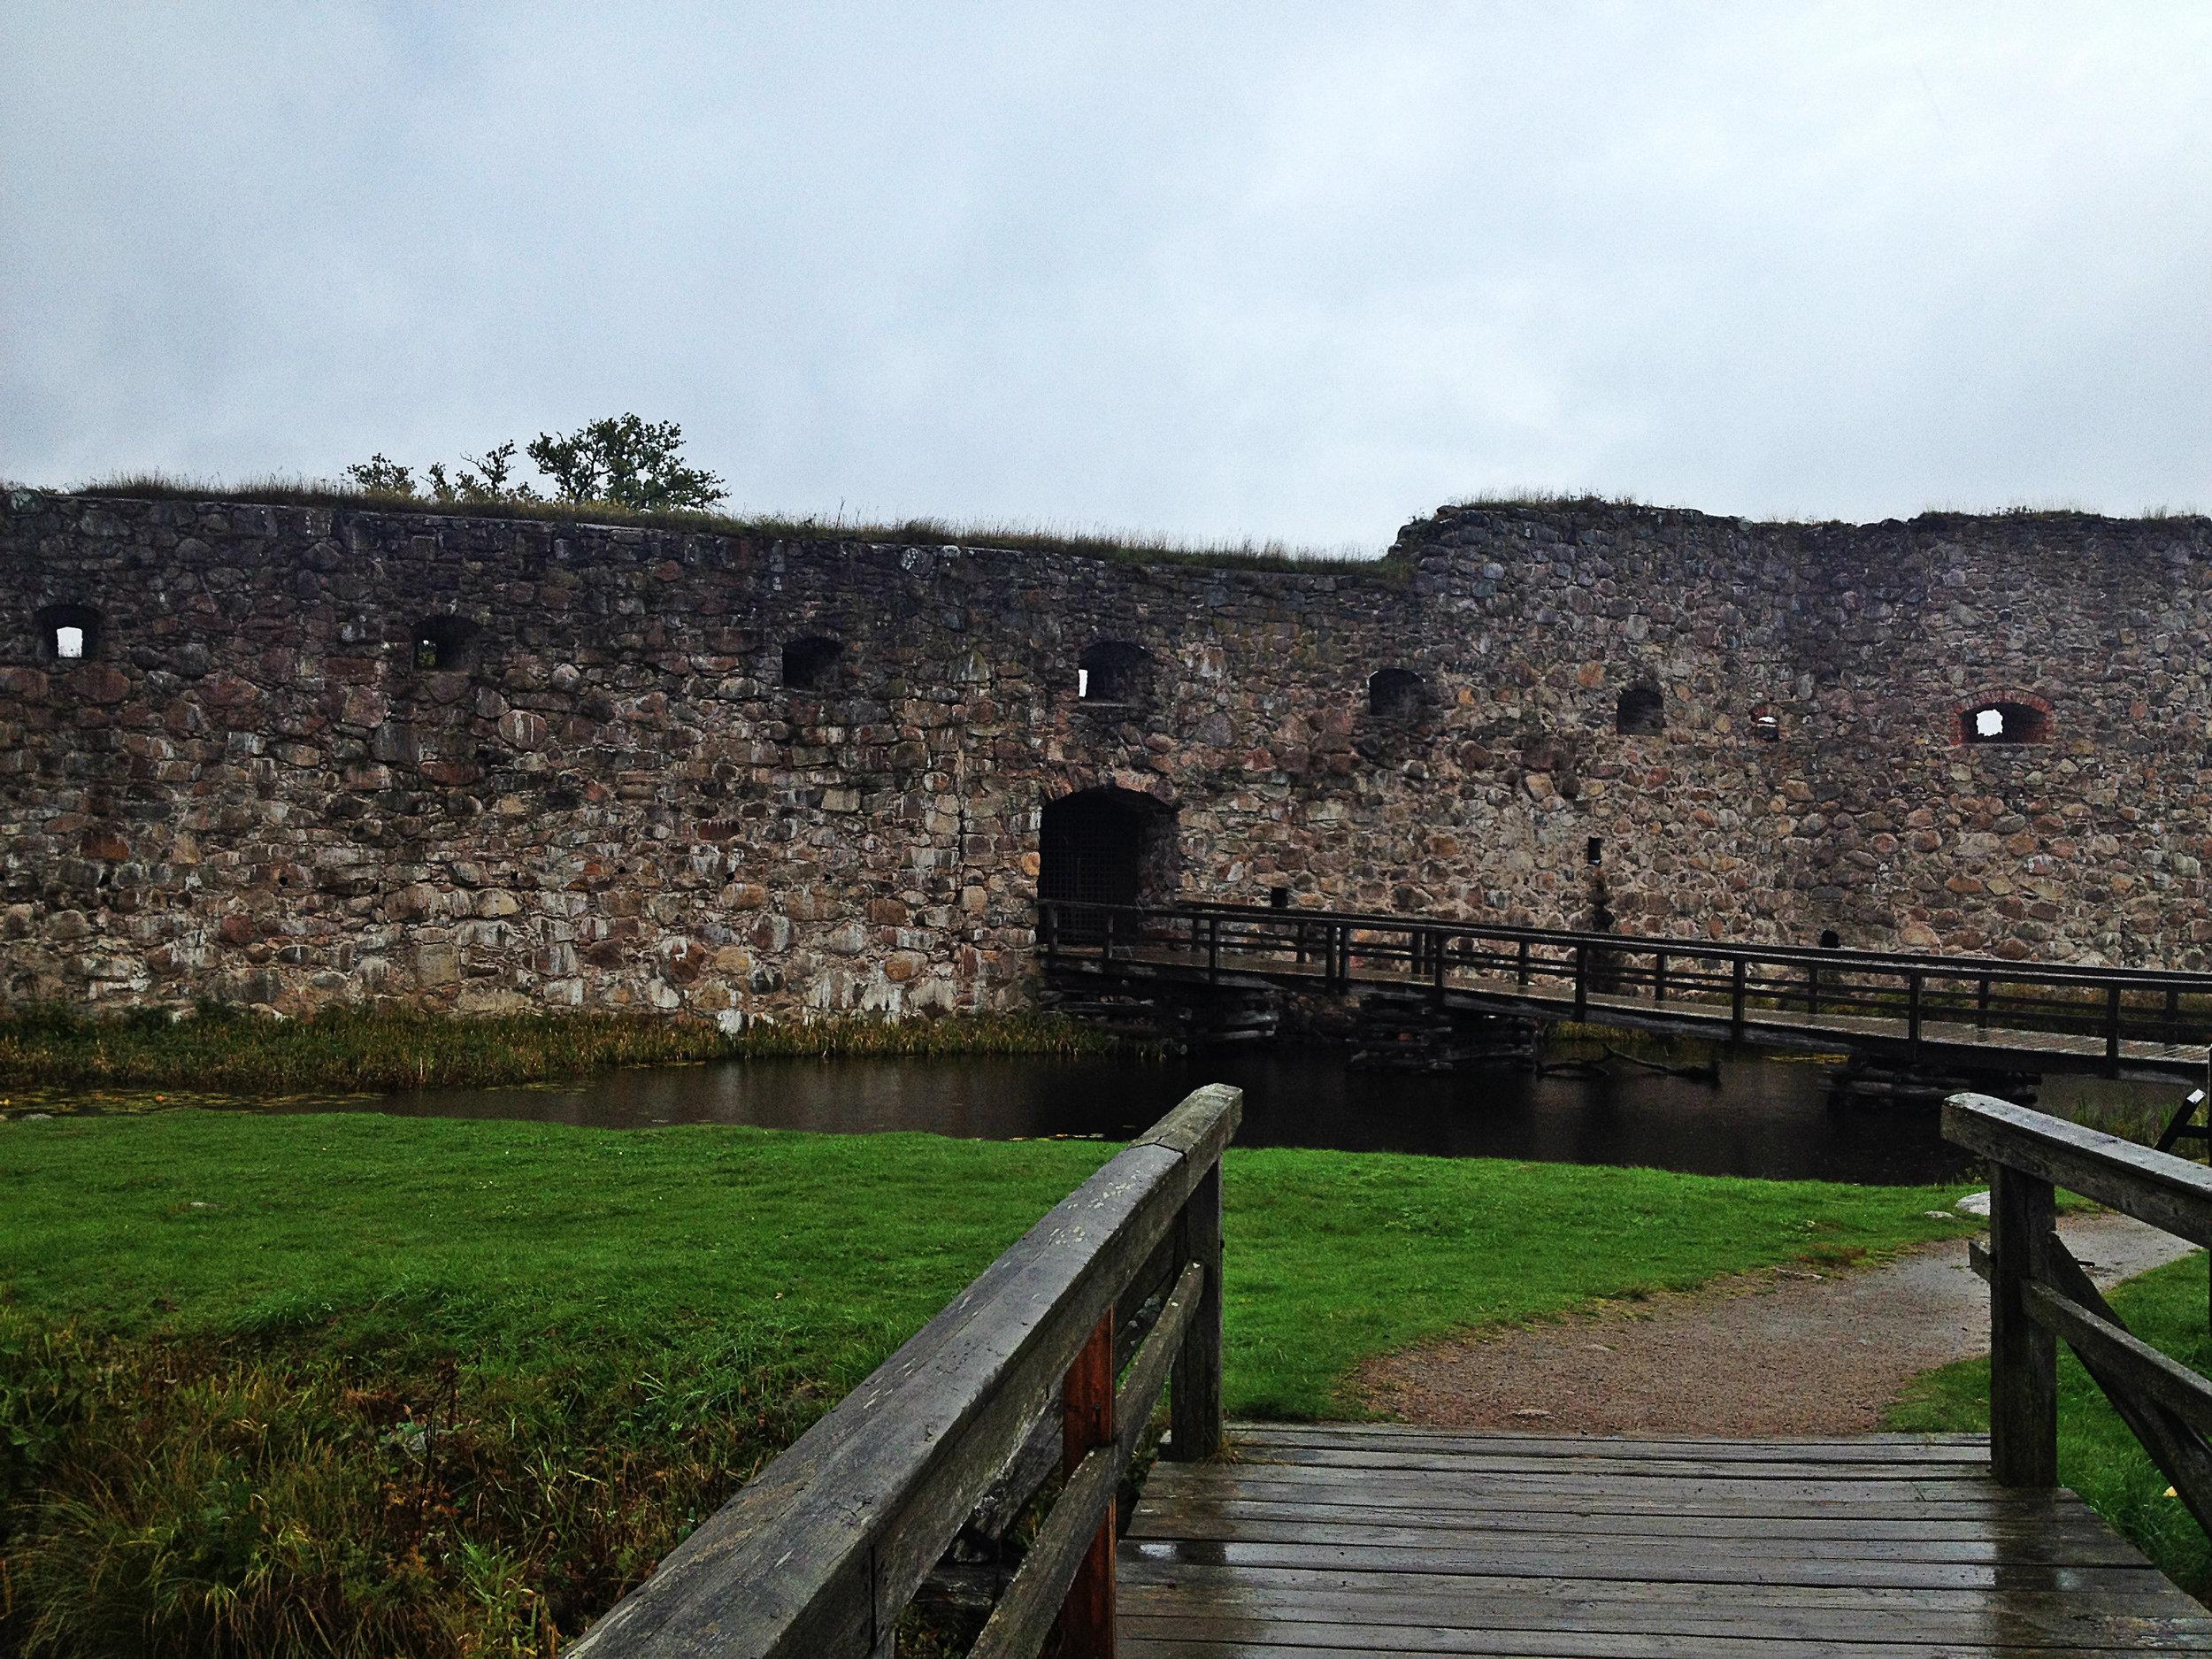 Castle Ruins and Bridge | Tall Girl Meets World